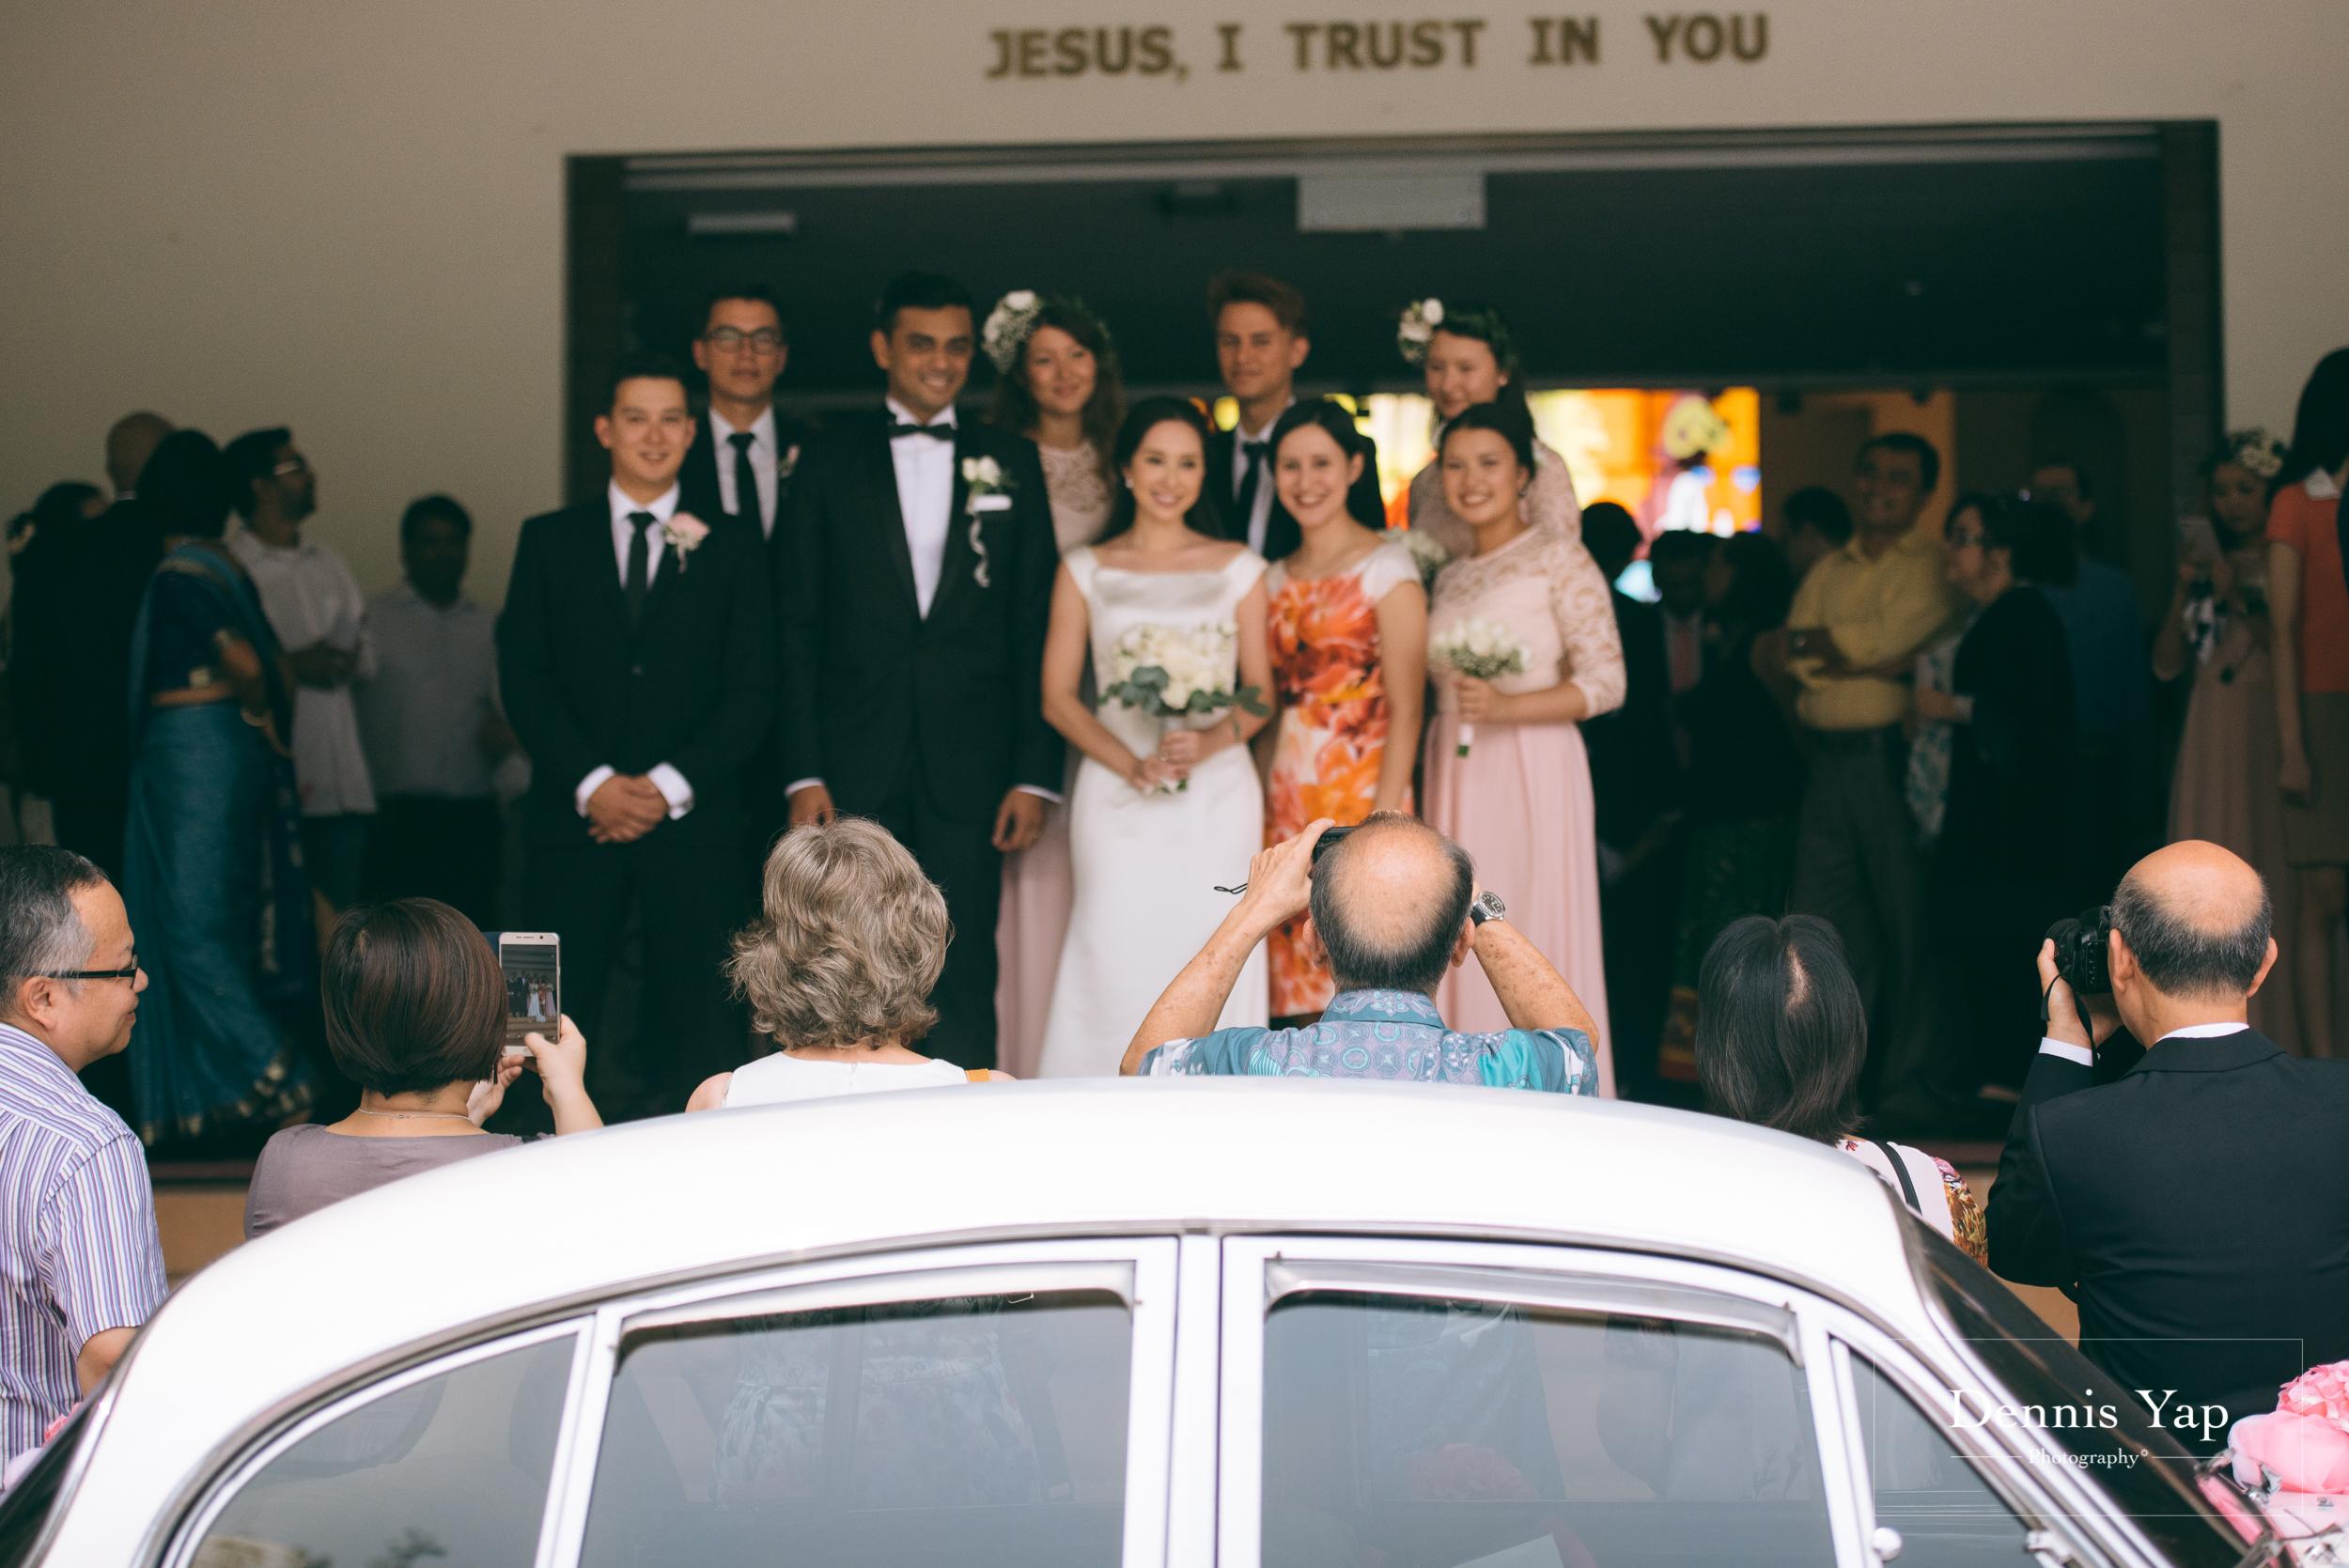 alroy teresa church wedding in church of divine mercy kuala lumpur malaysia wedding photographer dennis yap-25.jpg